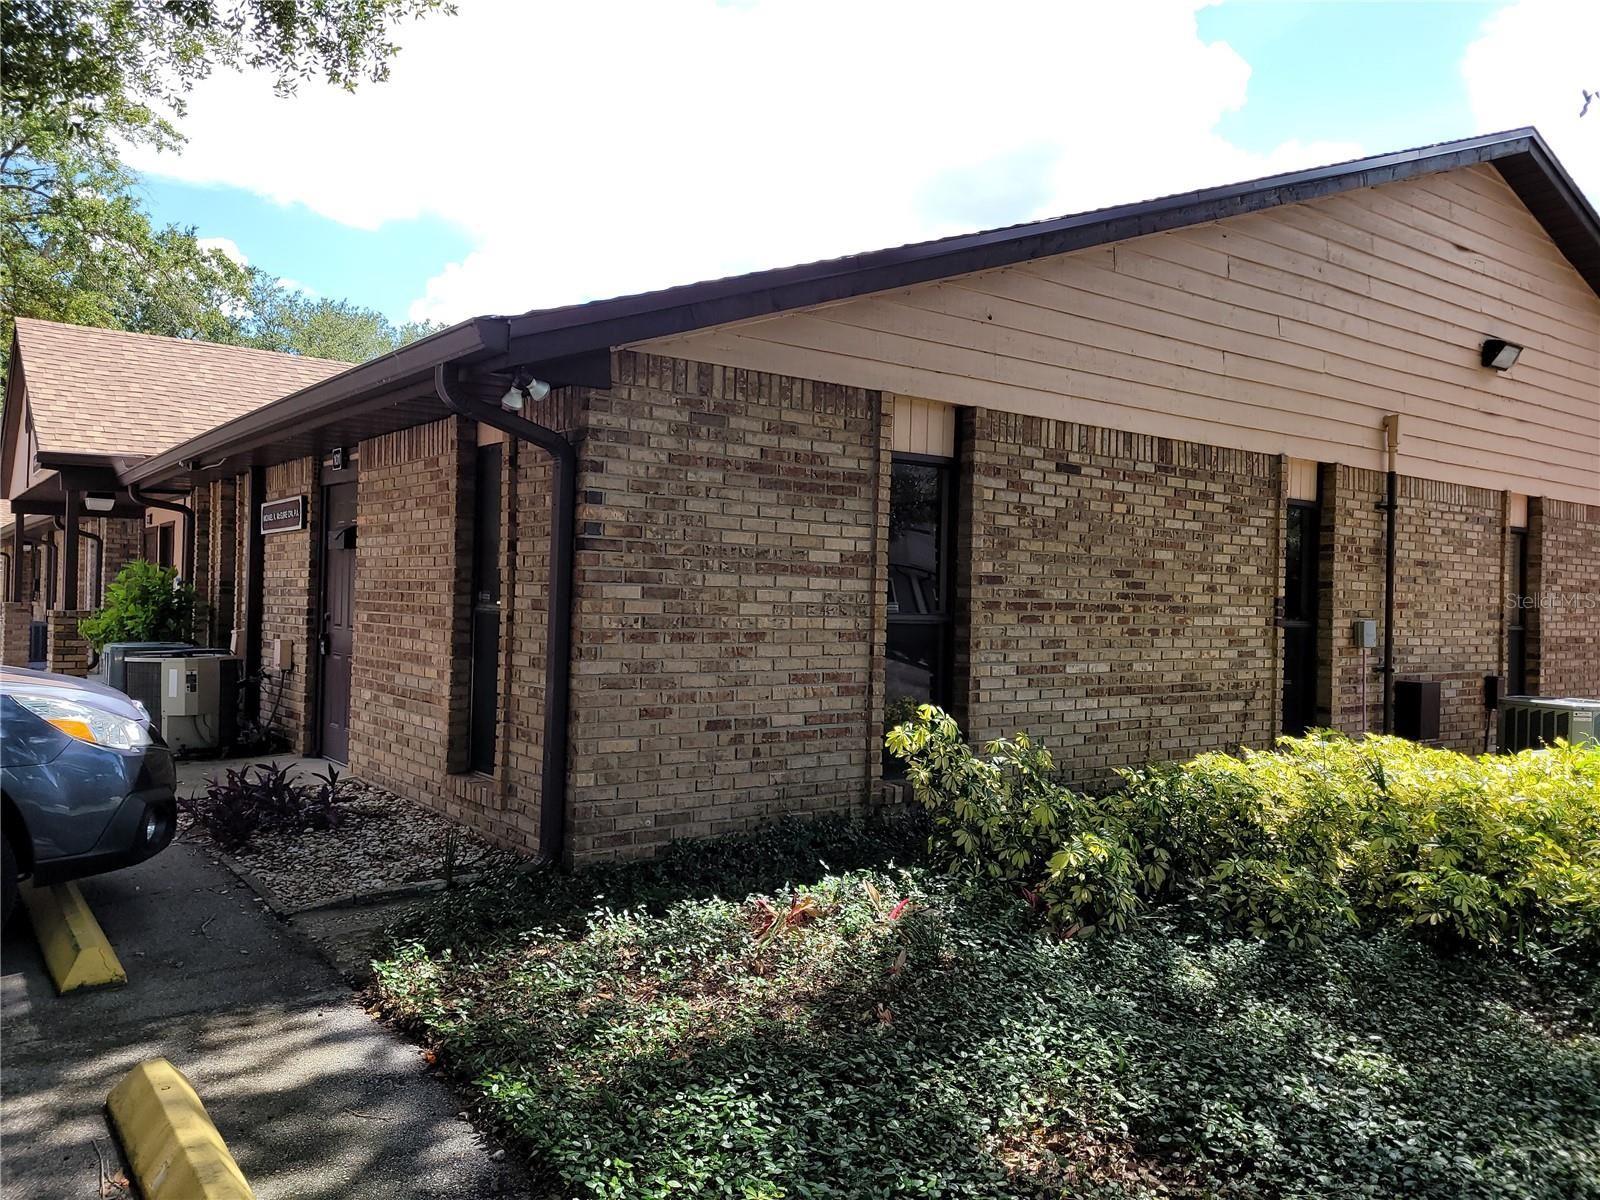 415 MONTGOMERY ROAD #101, Altamonte Springs, FL 32714 - #: O5961199